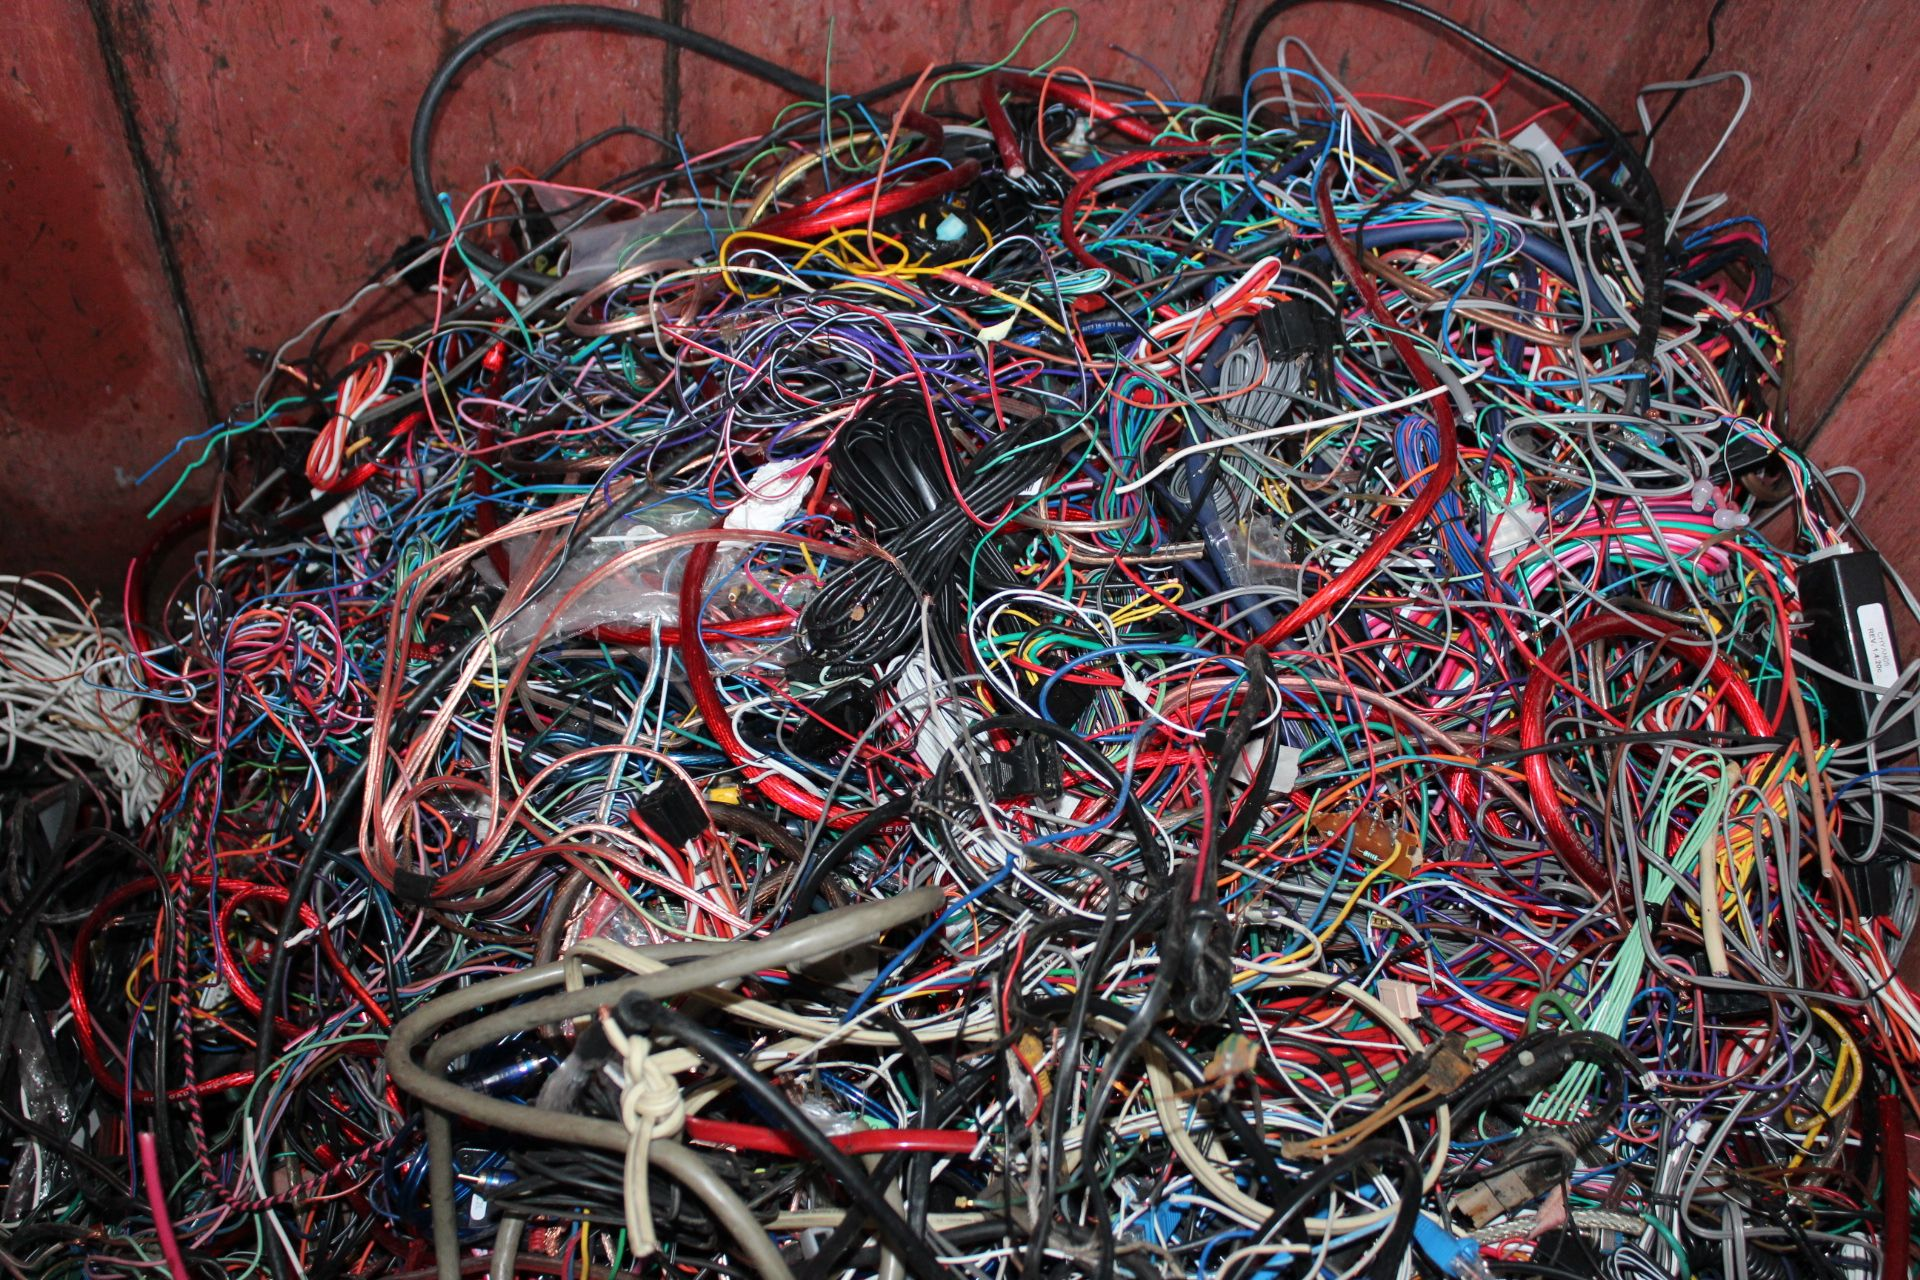 Insulated-Copper-Wire-2-Copper-Wire-Recycling.jpg (1920×1280 ...